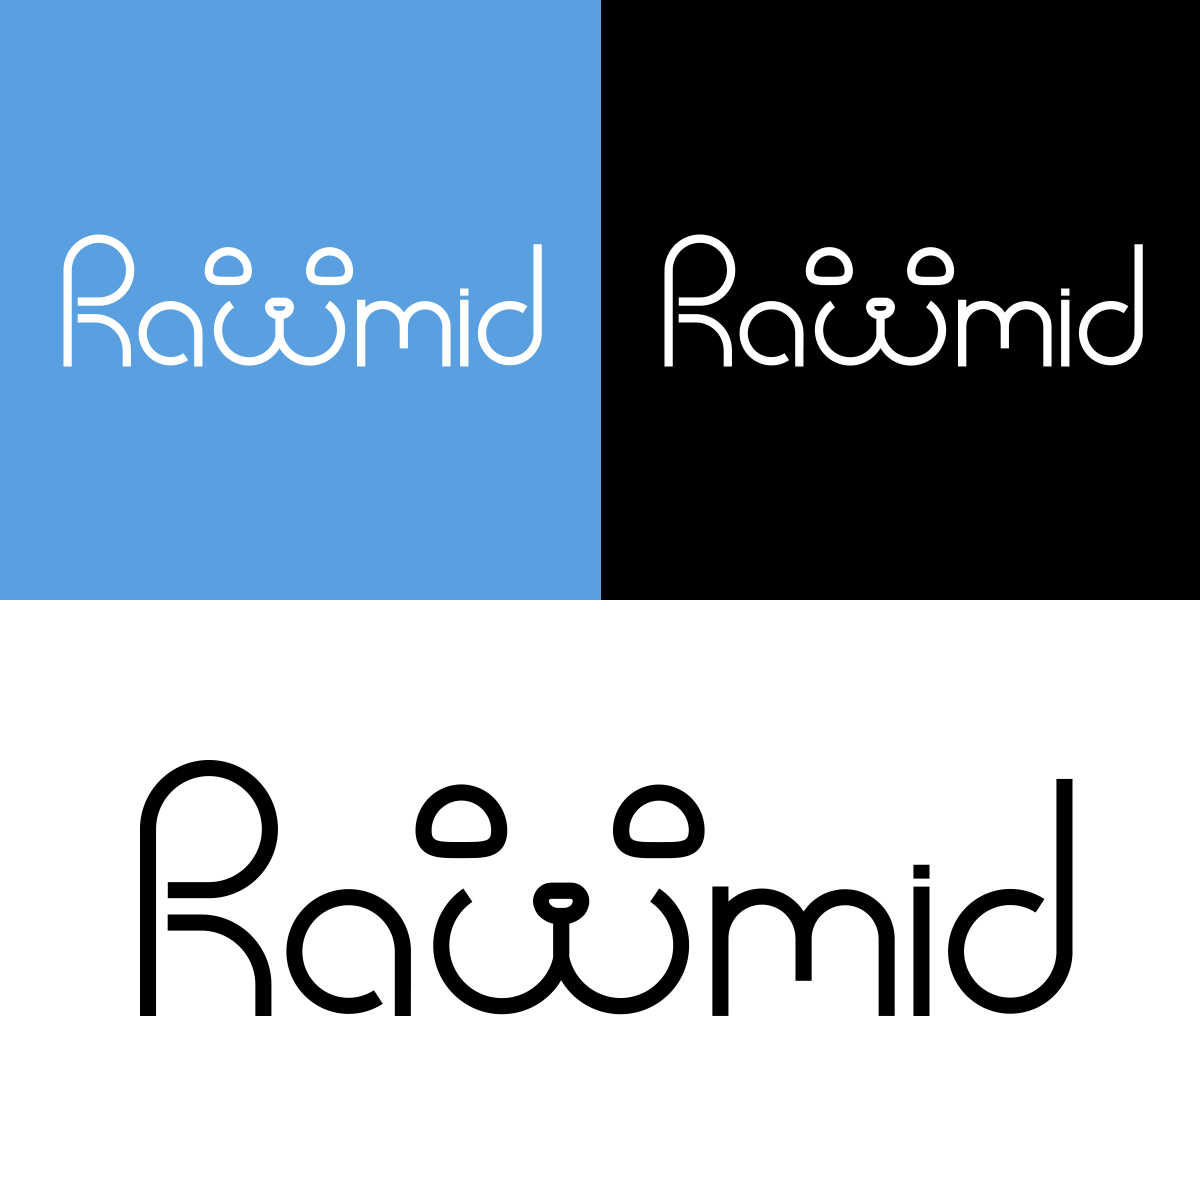 Логотип Rawmid